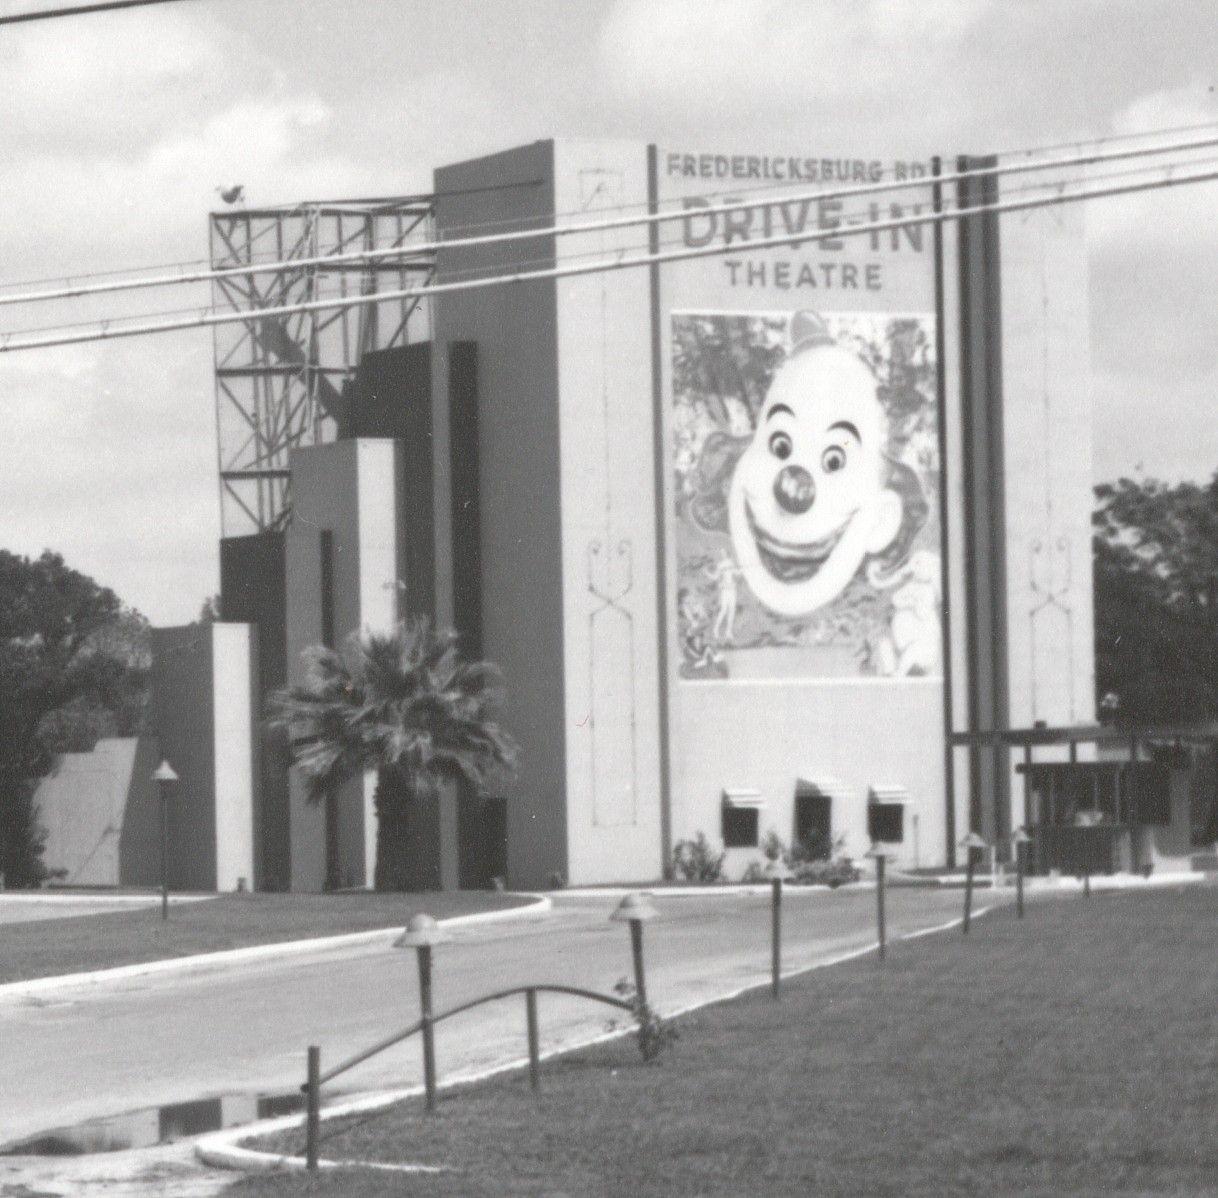 Fredericksburg road drivein theatre san antonio tx